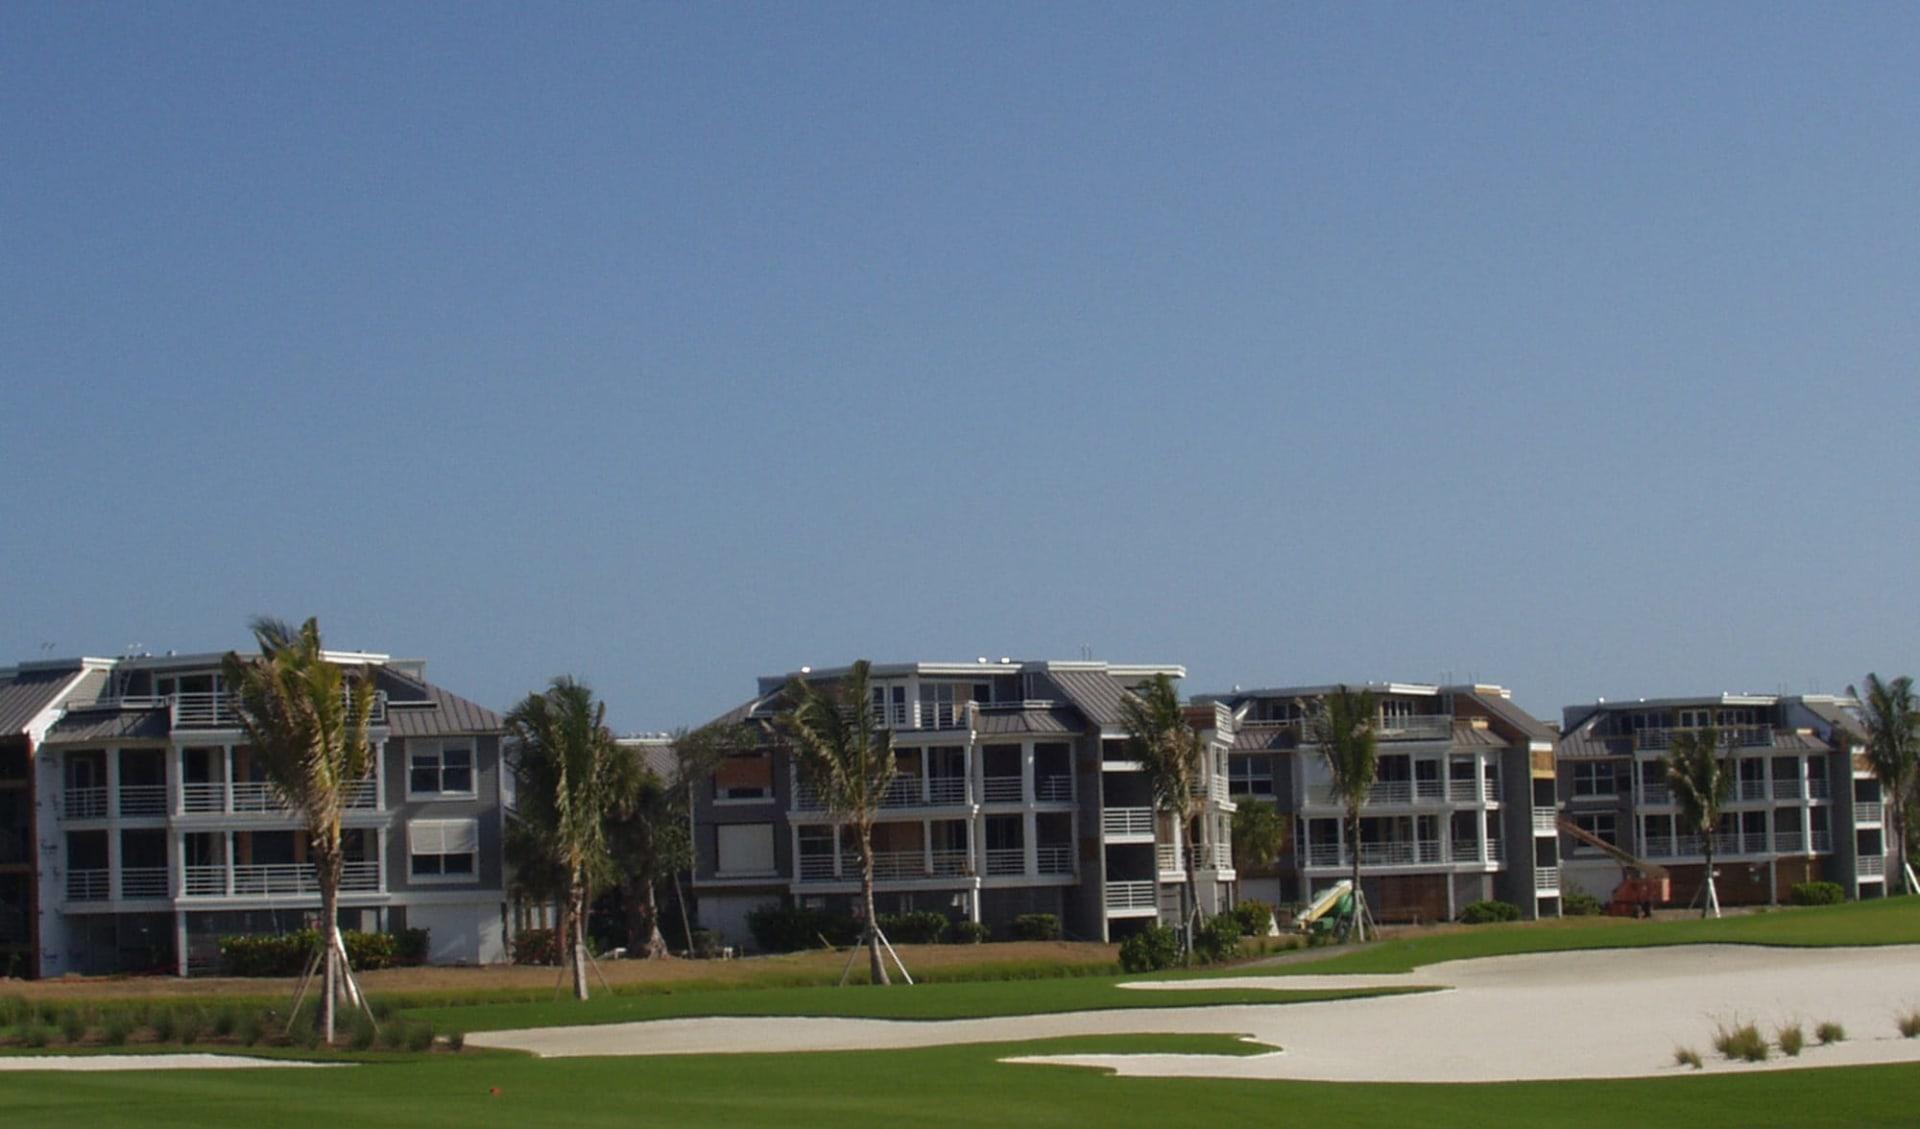 Land's End Resort in Homer:  South Seas Island Resort - Lands End